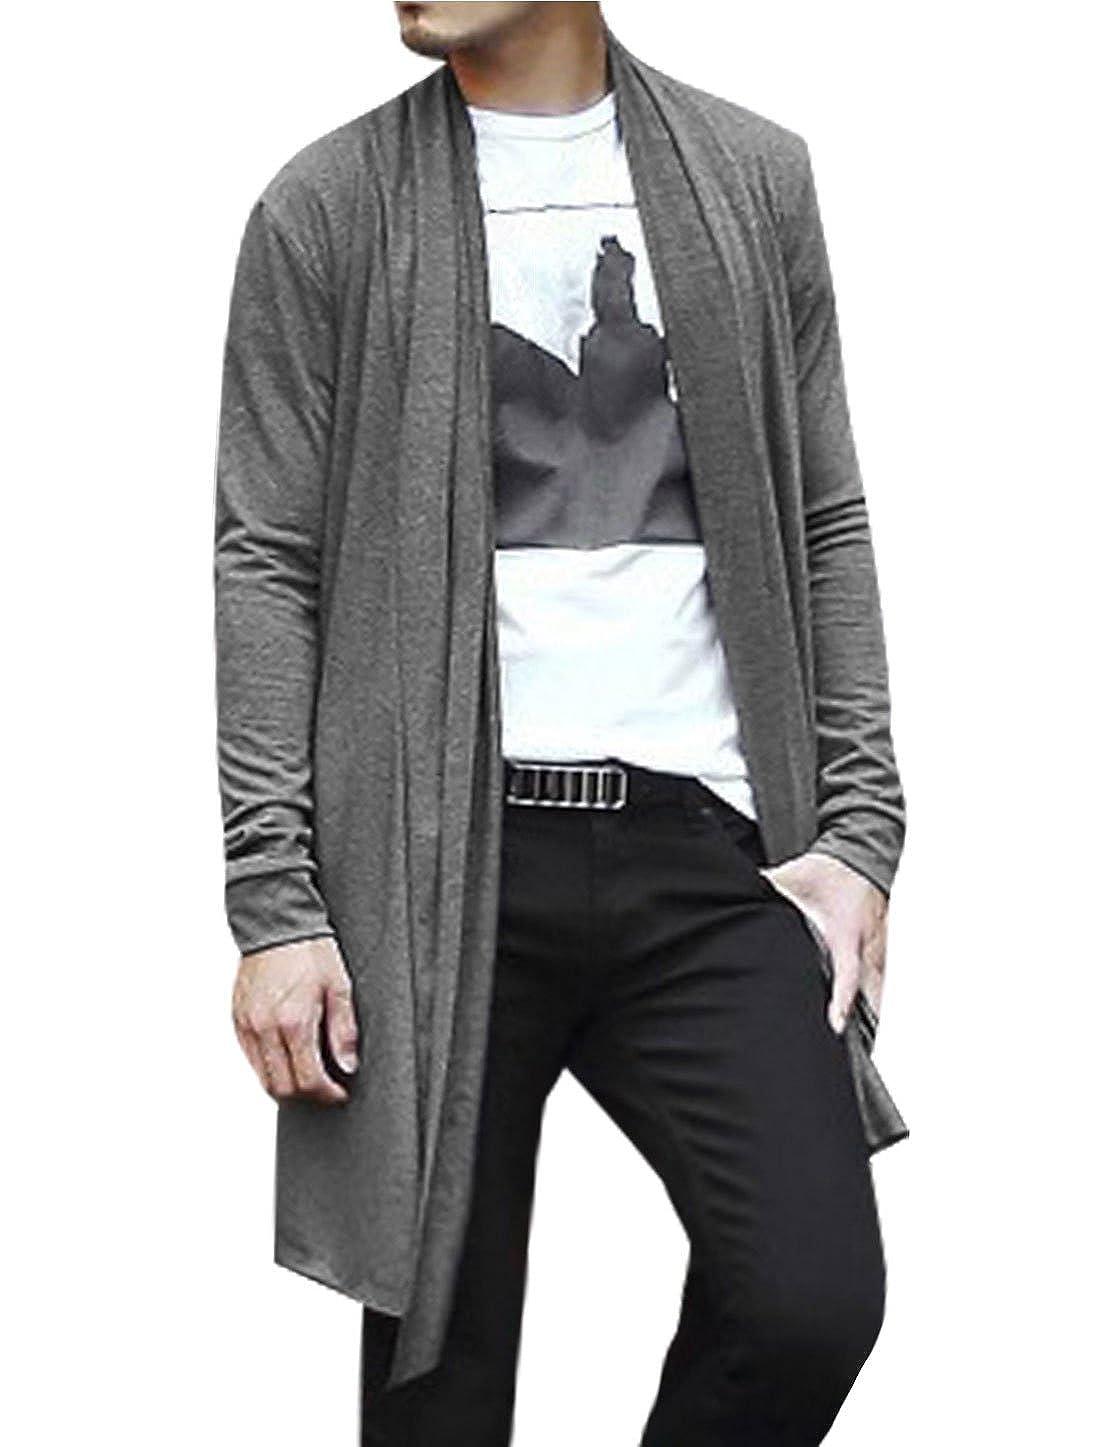 uxcell® Men Long Sleeve Pockets High-Low Hem Casual Long Cardigan S Grey a15042000ux0065